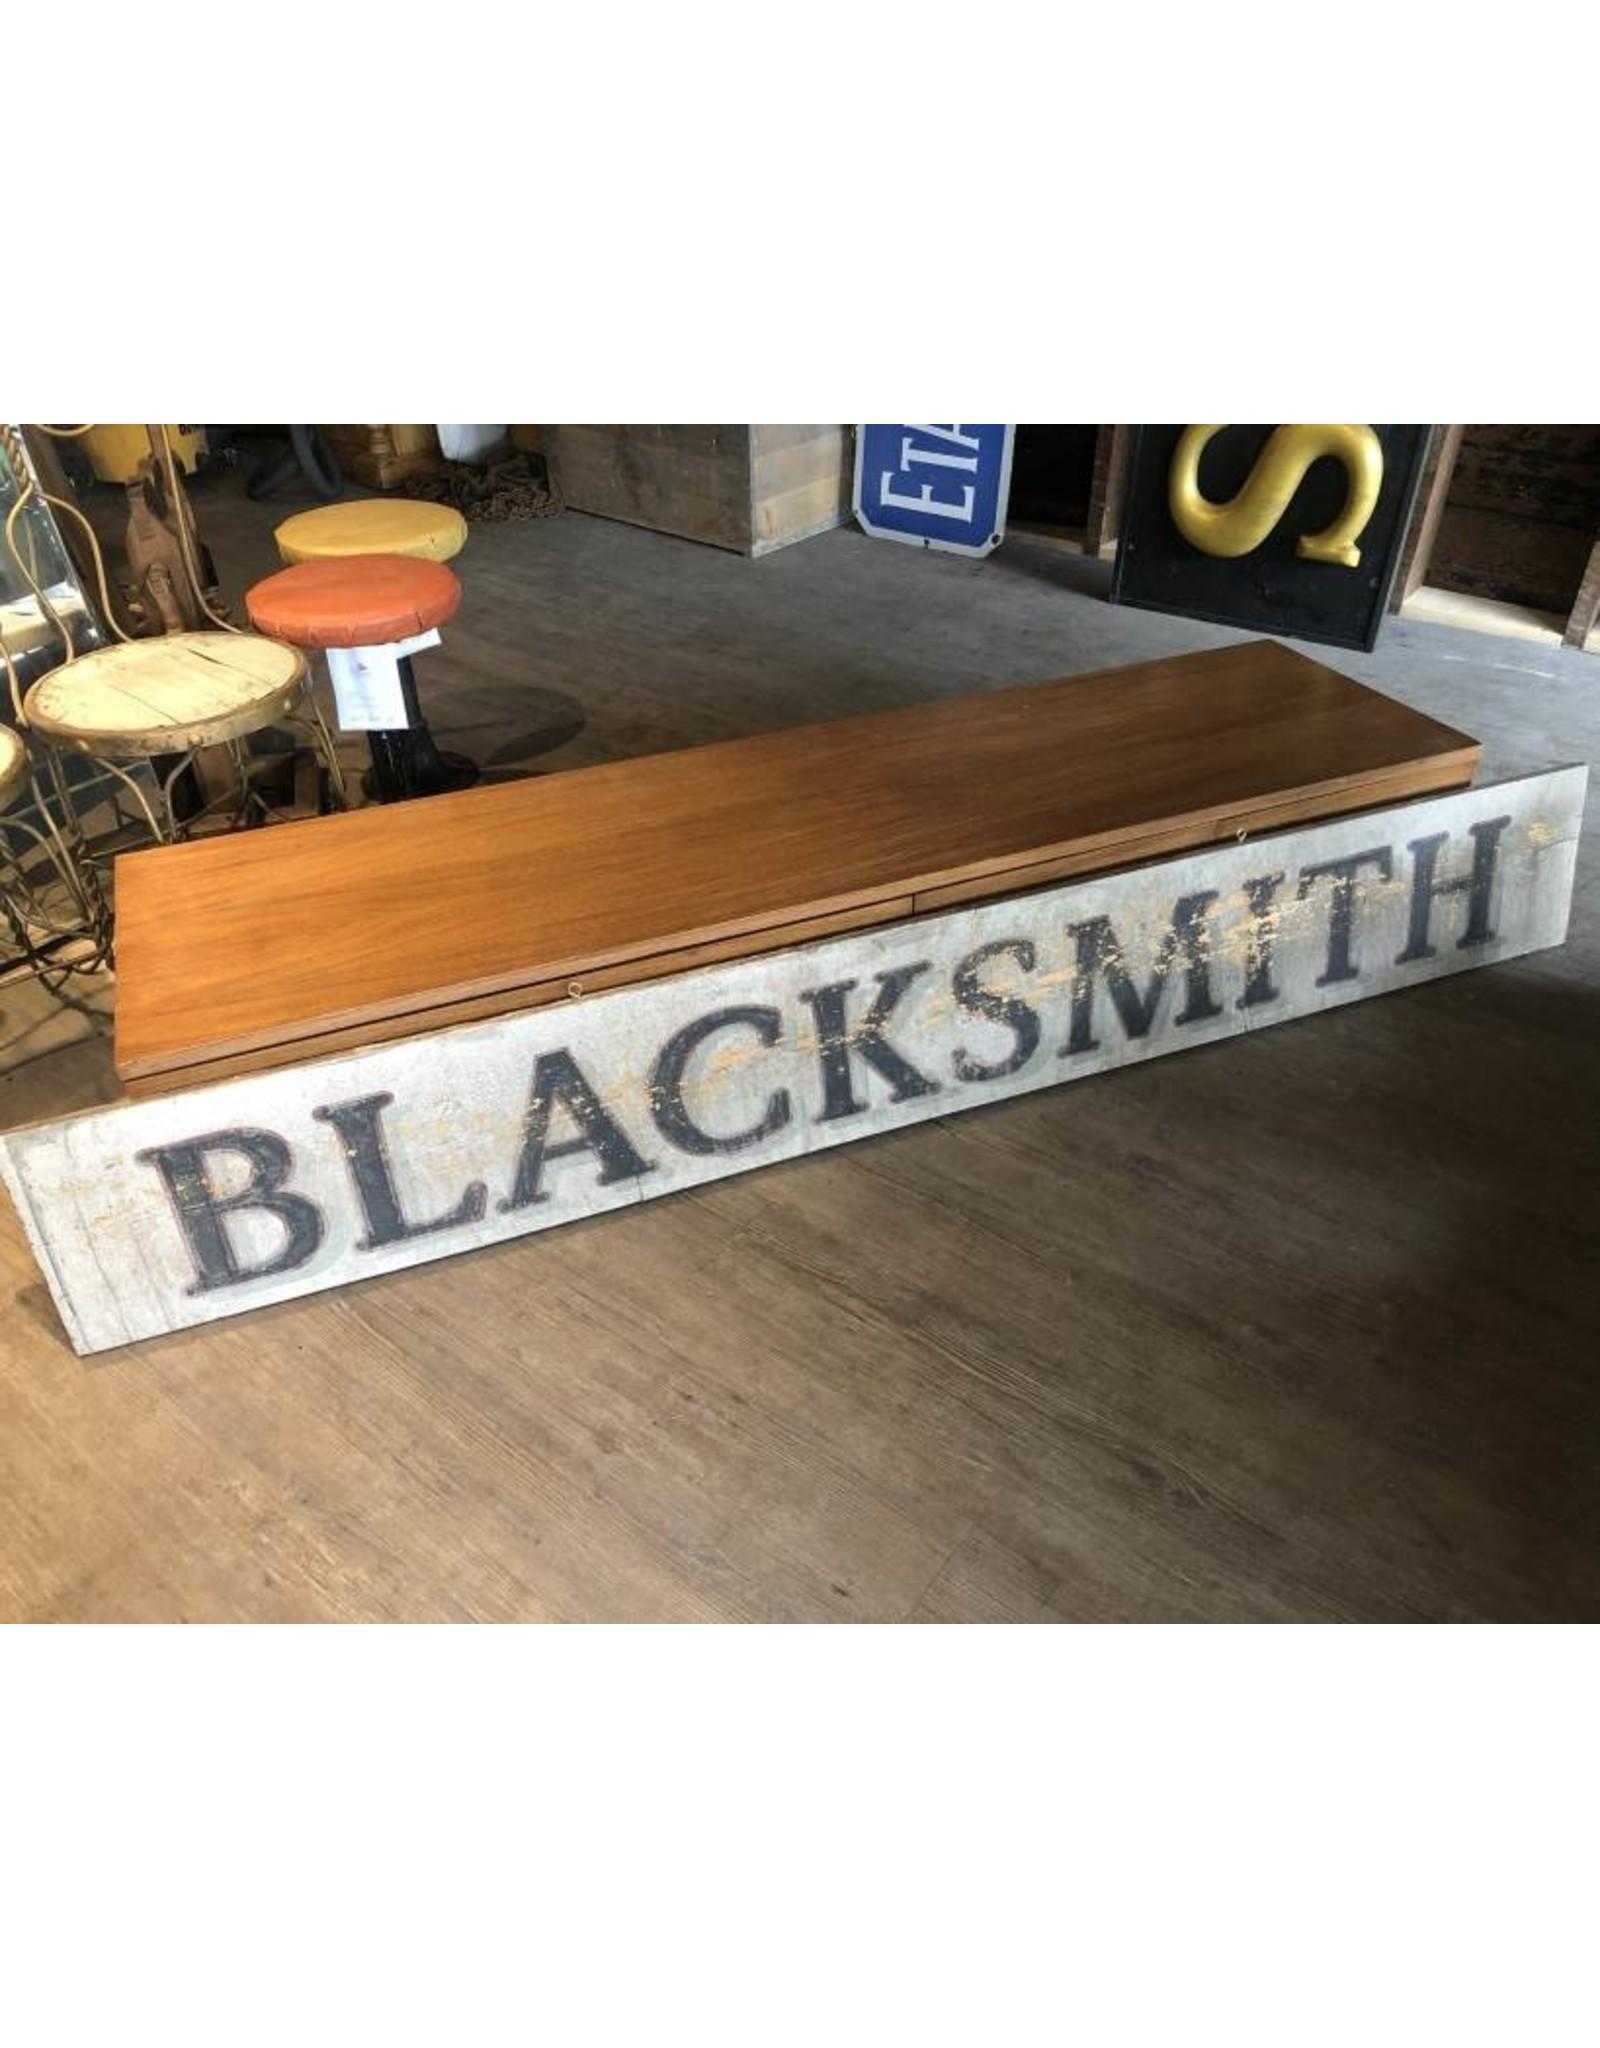 Blacksmith sign - vintage, double sided, wood